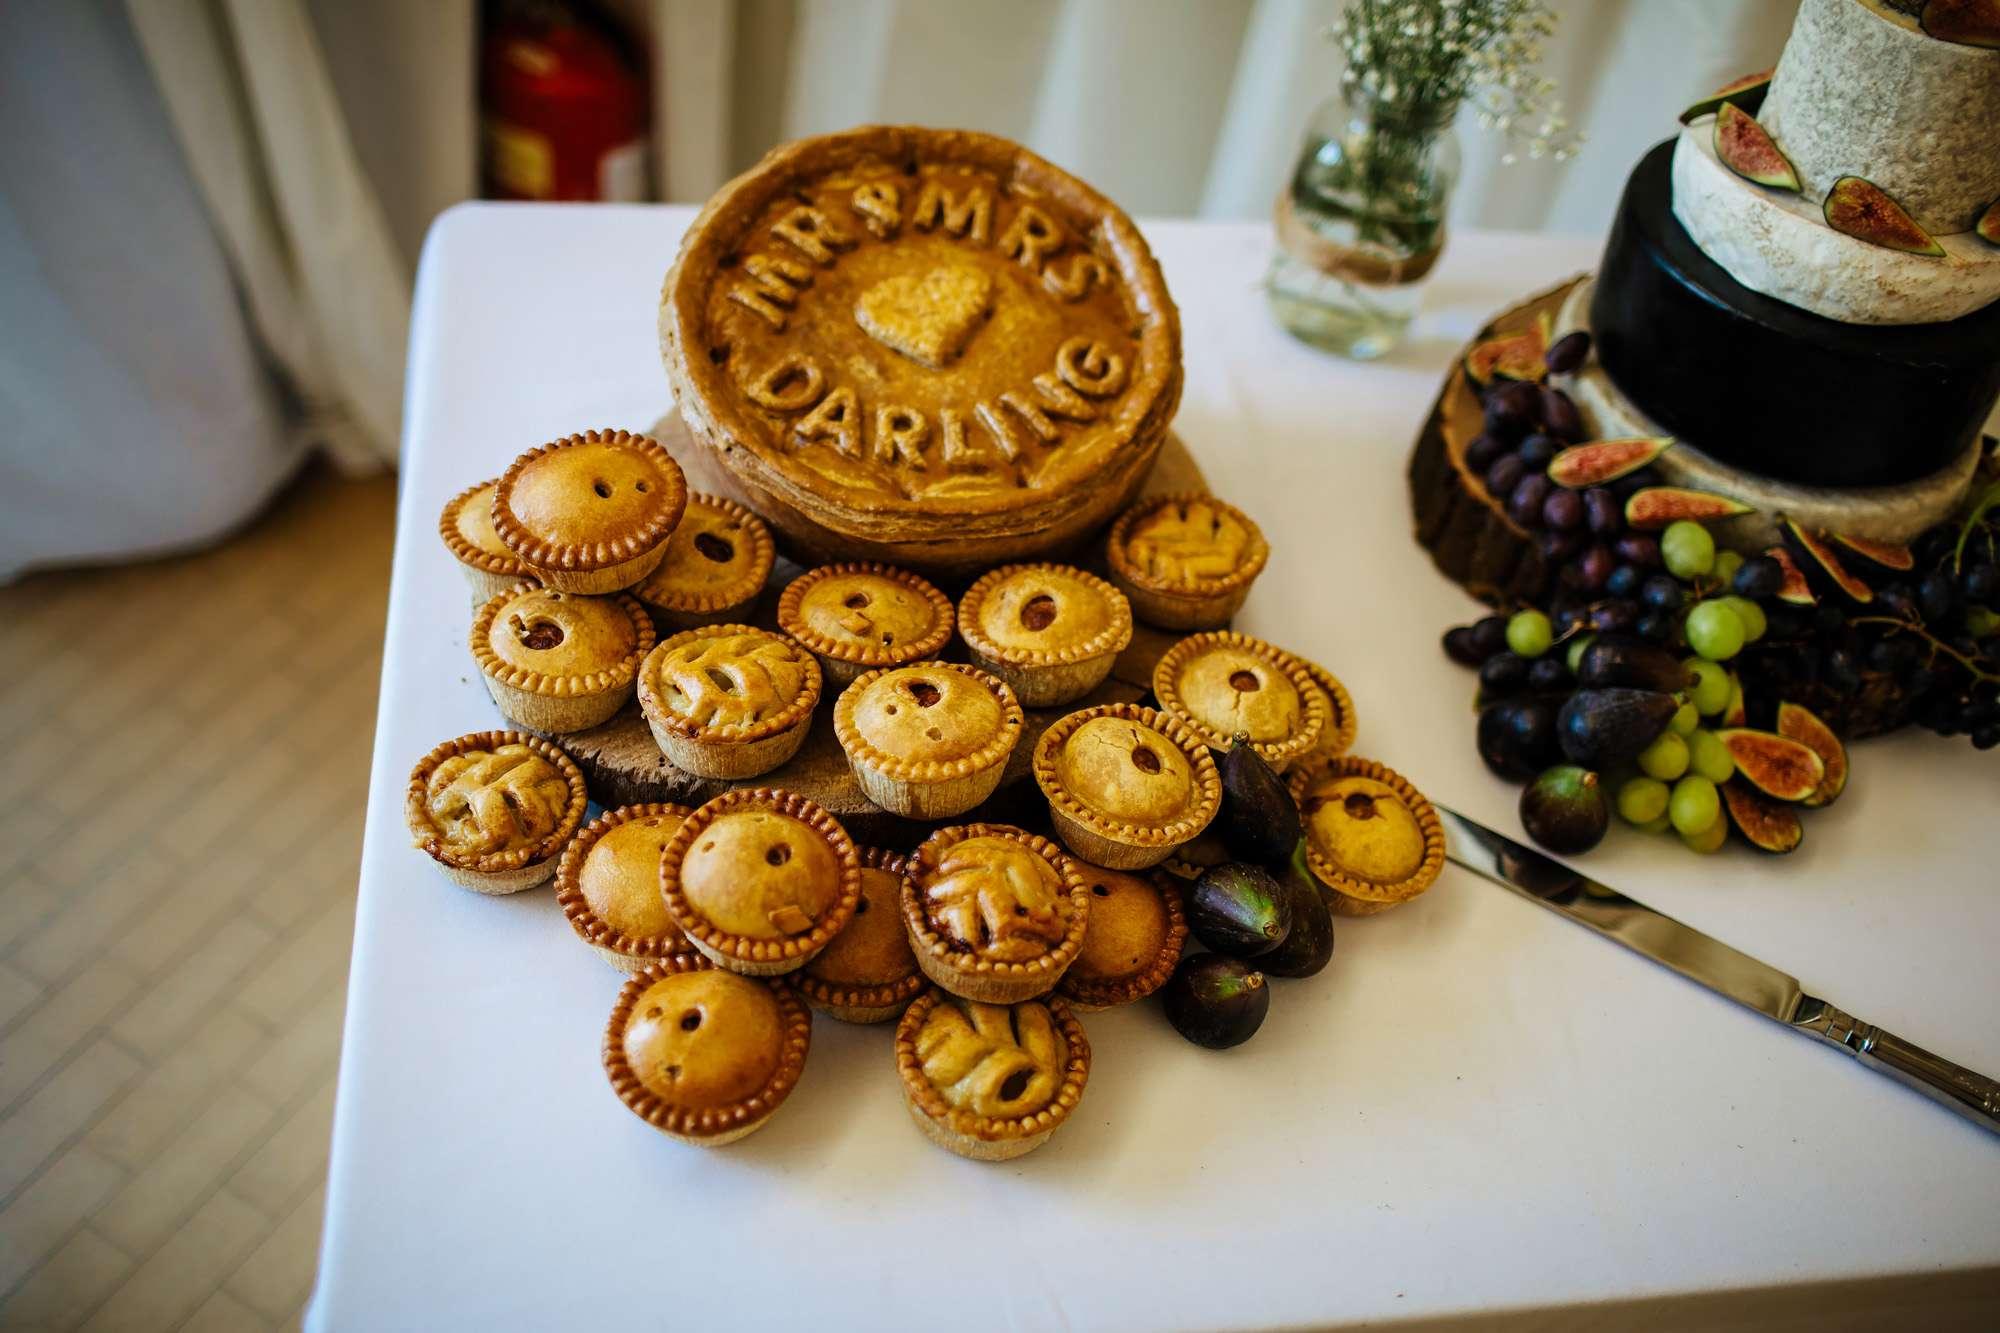 Personalised pork pie cake for a Leeds wedding